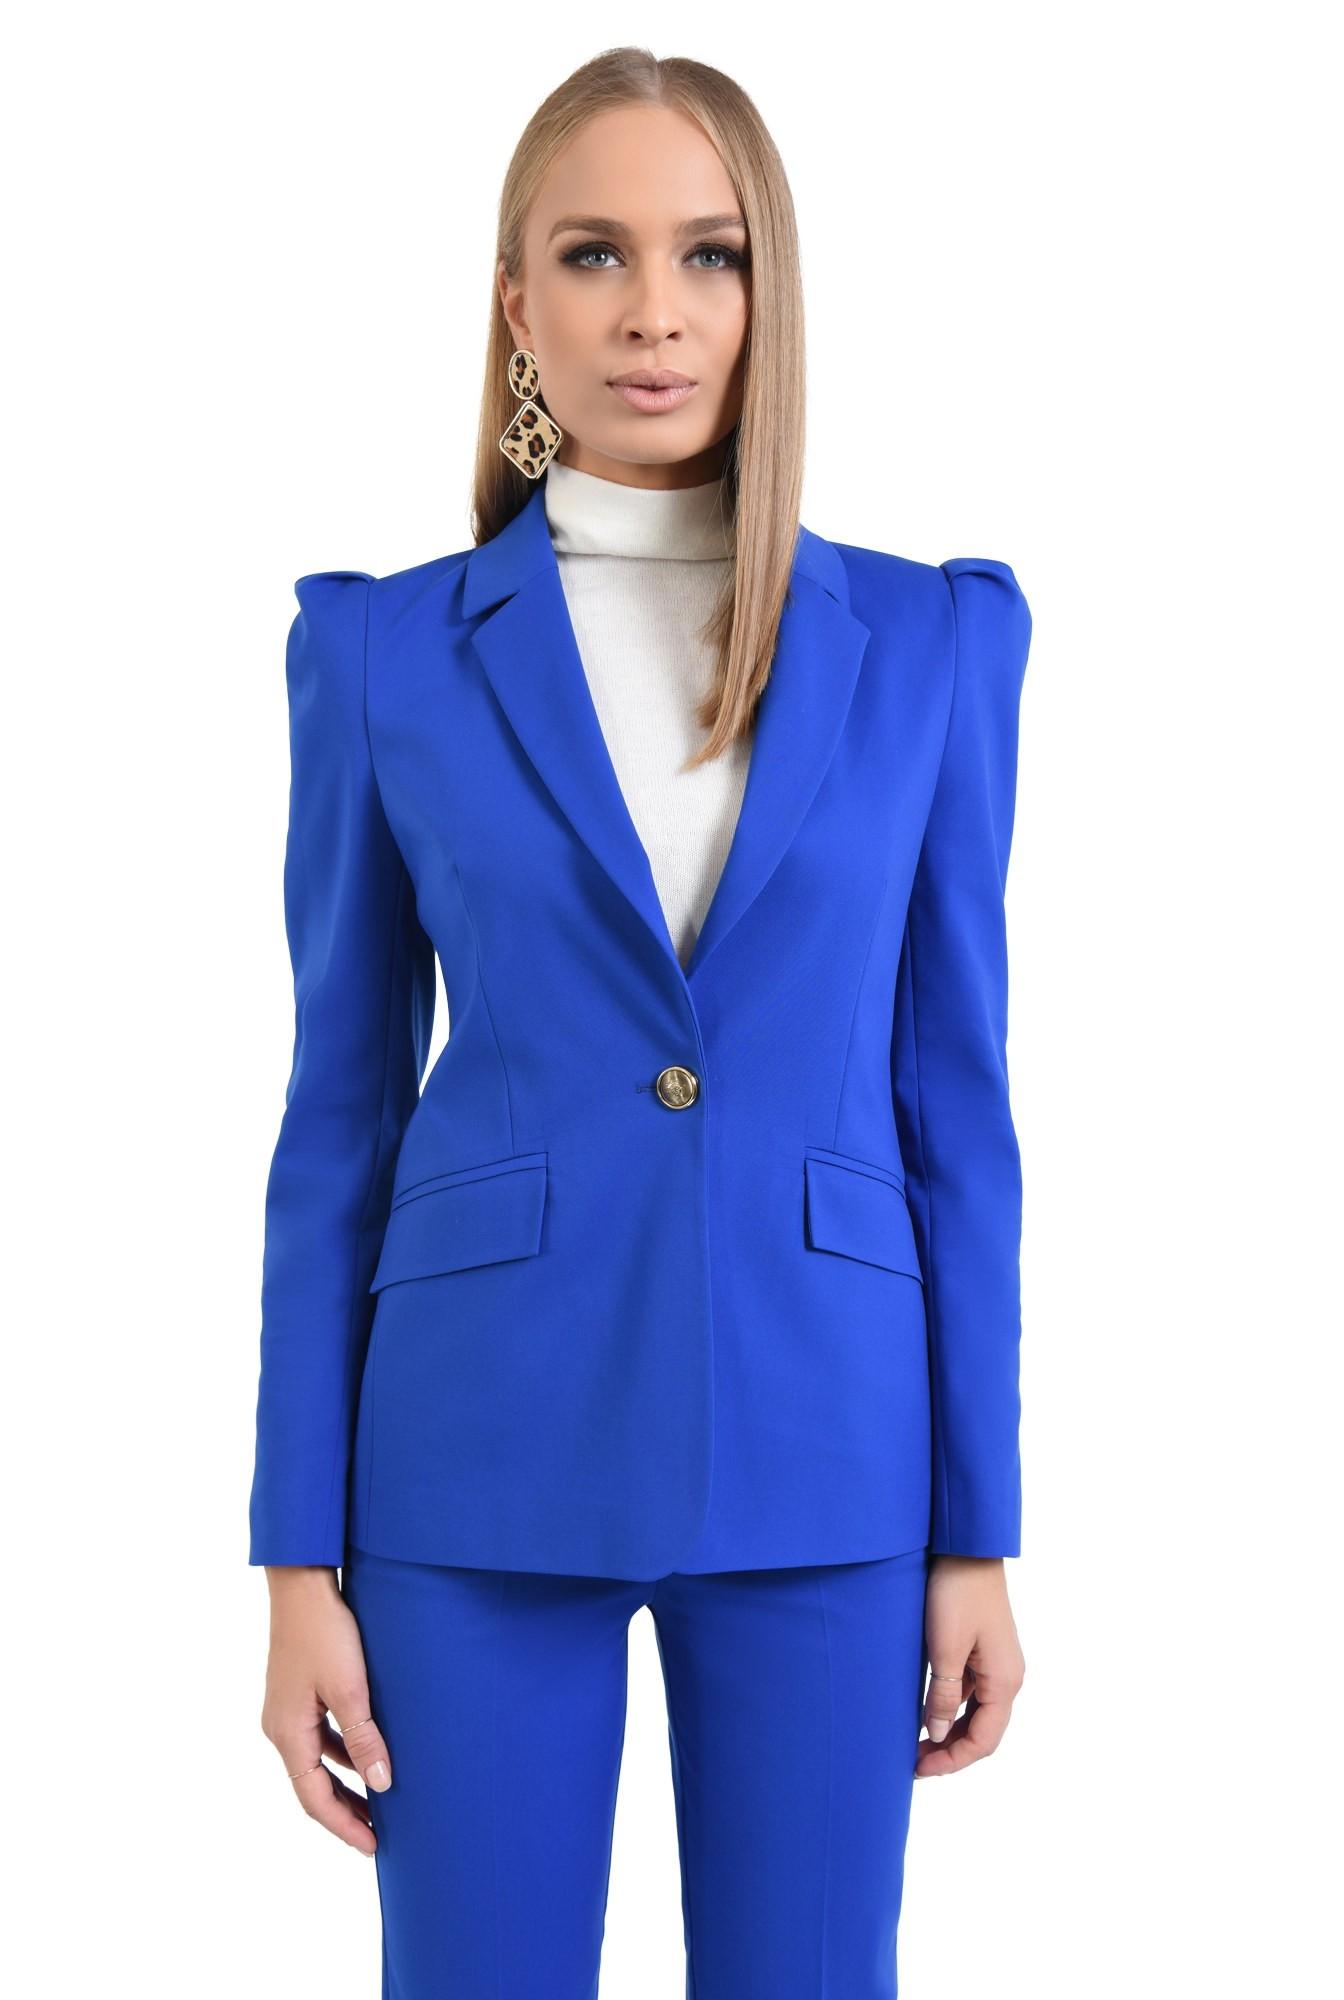 pantaloni dama, online, costum, albastru, croi conic